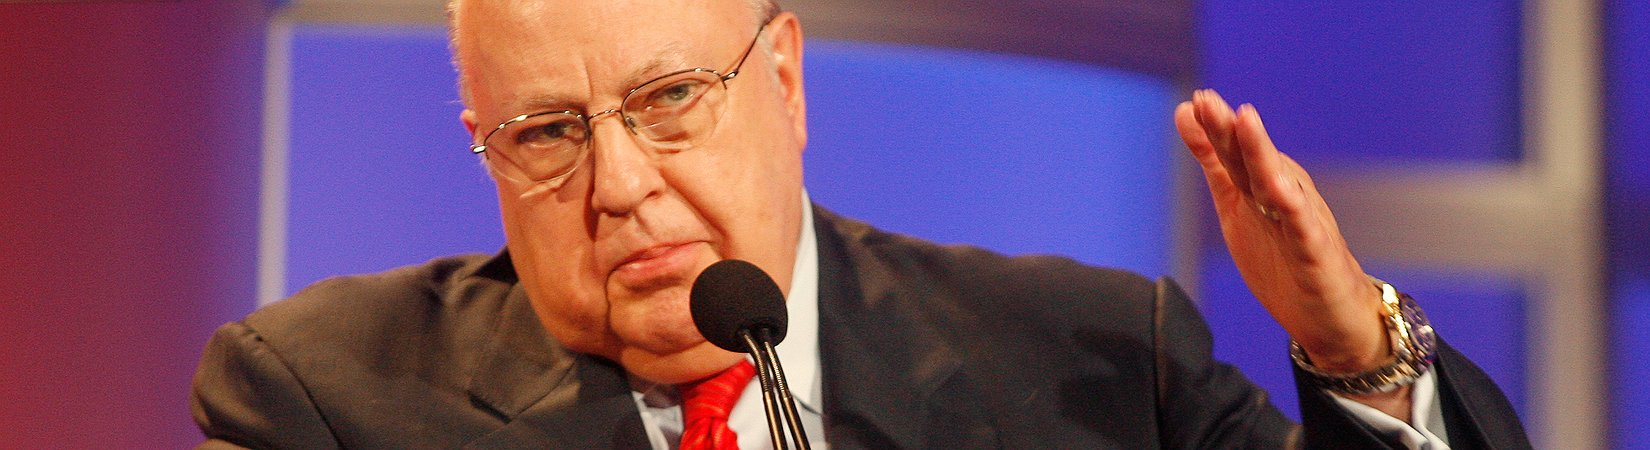 Fox News founder Roger Ailes dies